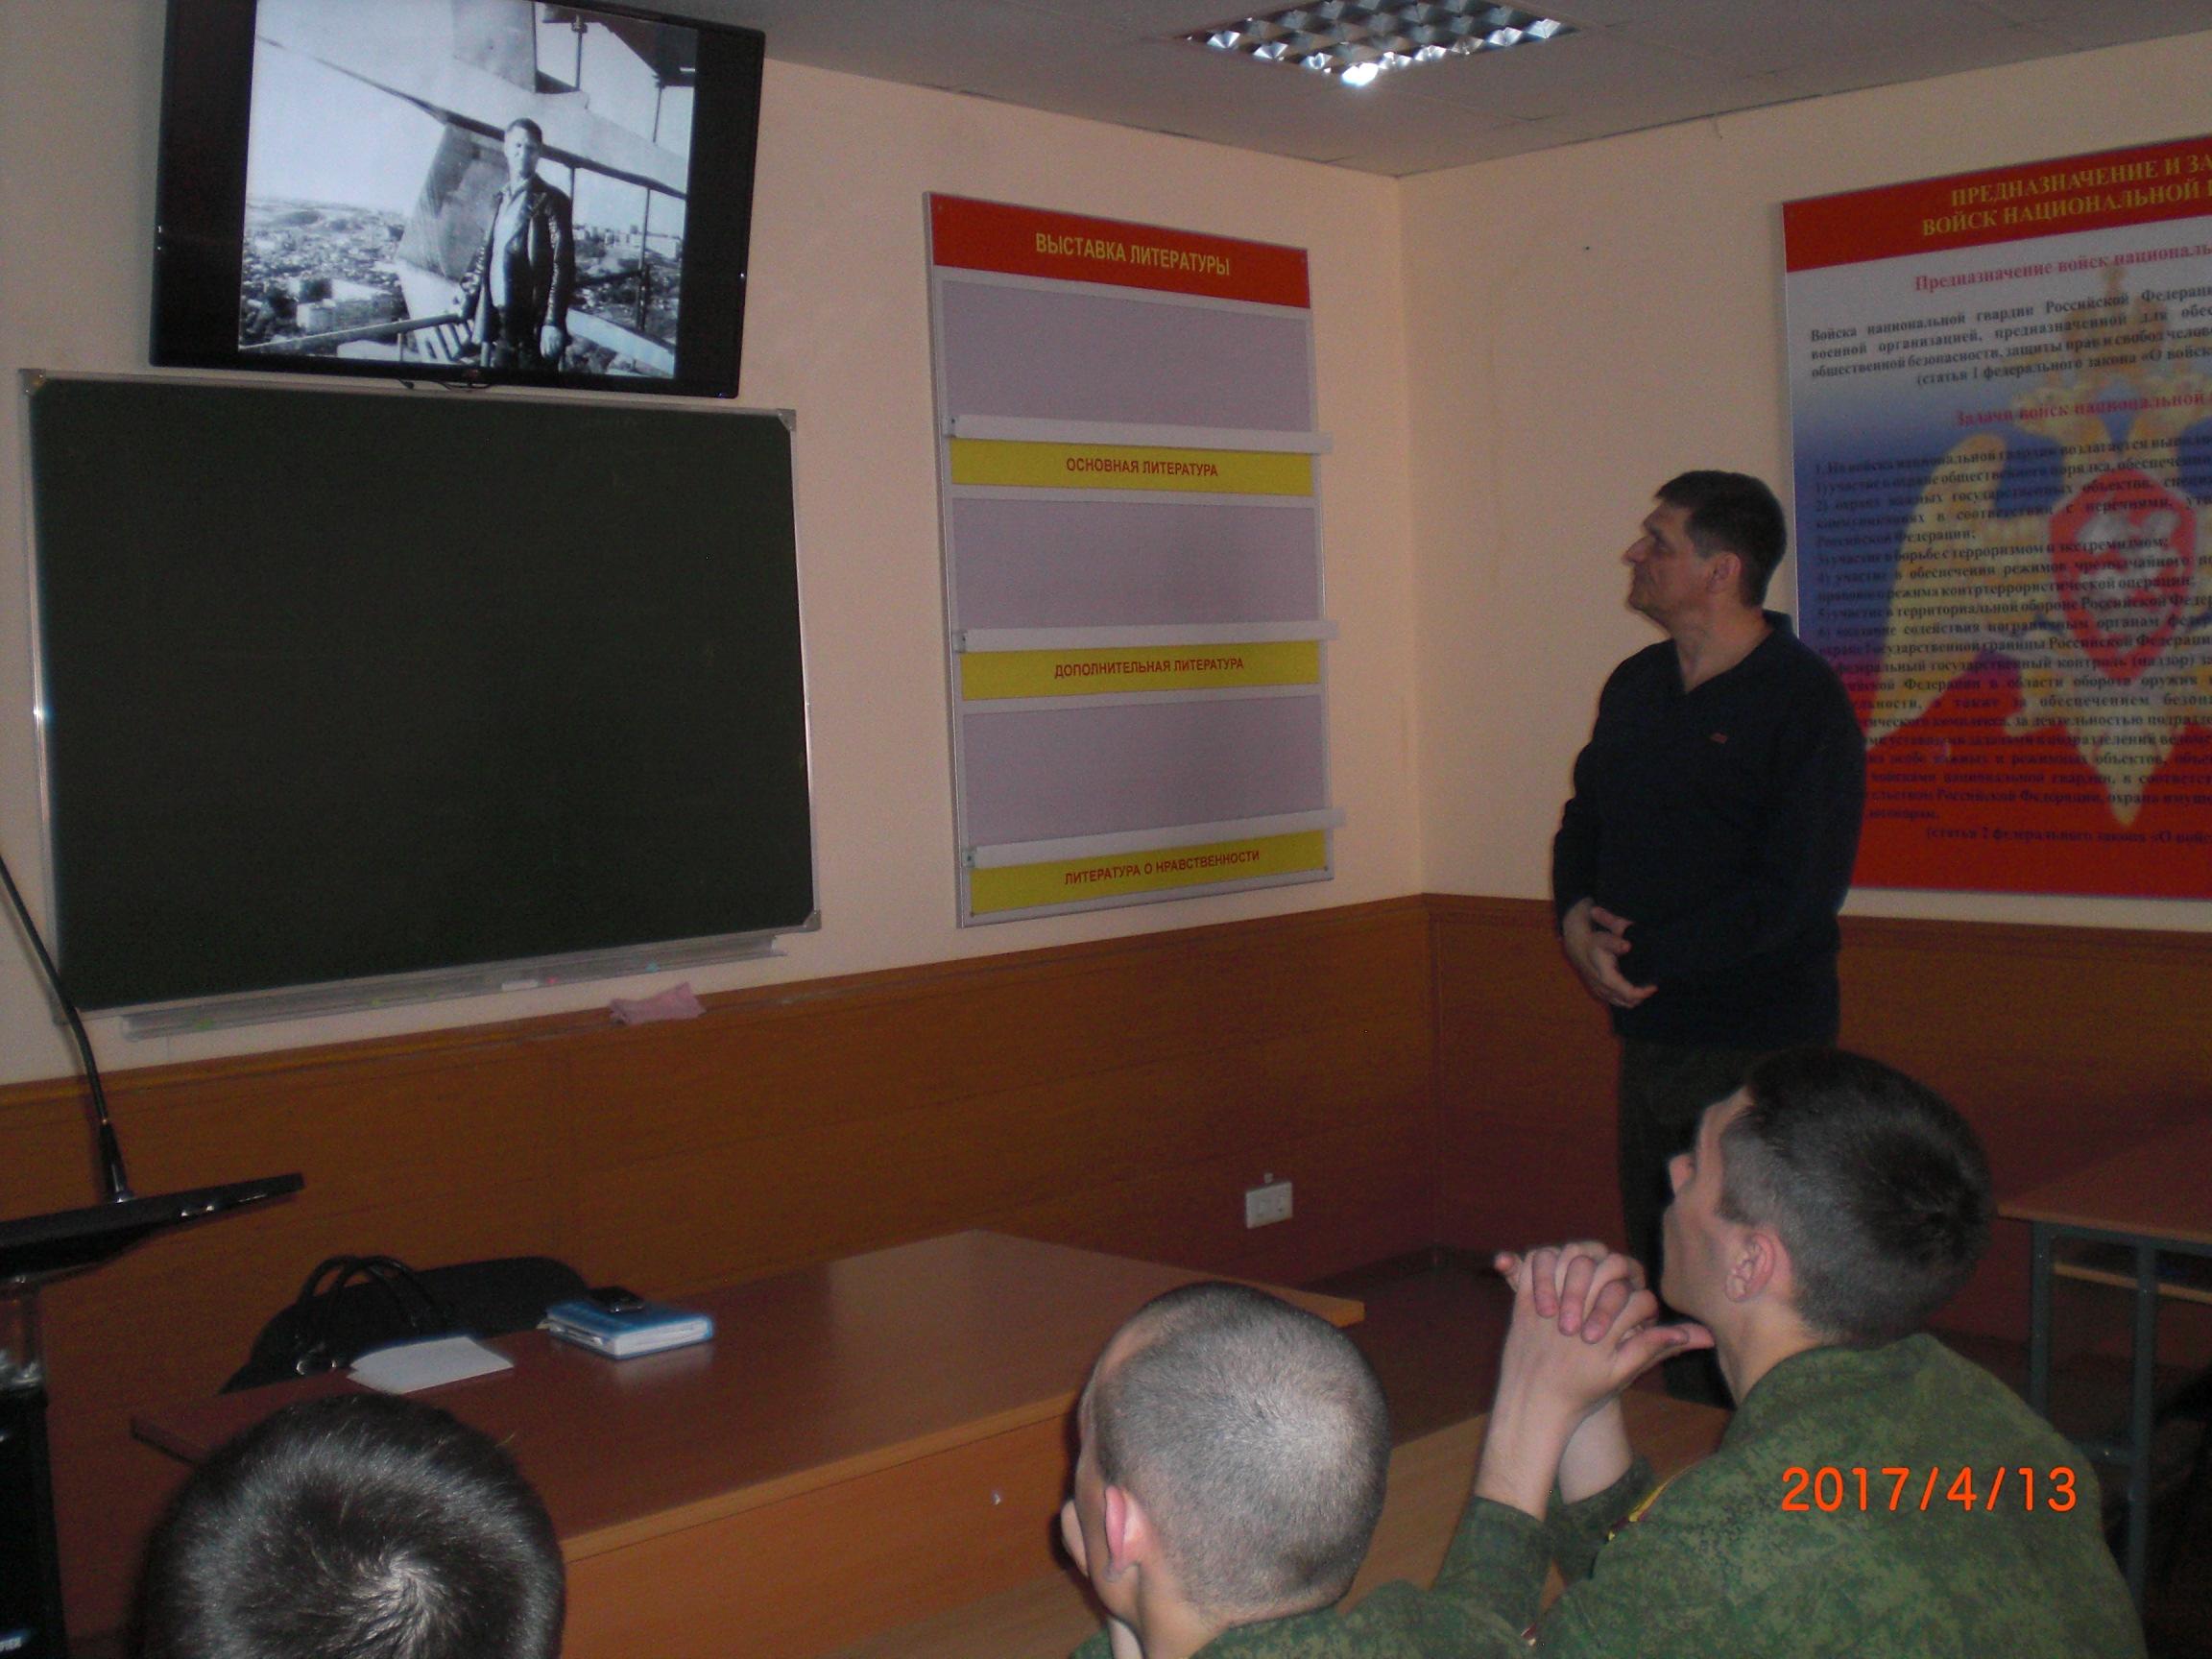 Сын архитектора Менякина рассказал курсантам о жизни отца